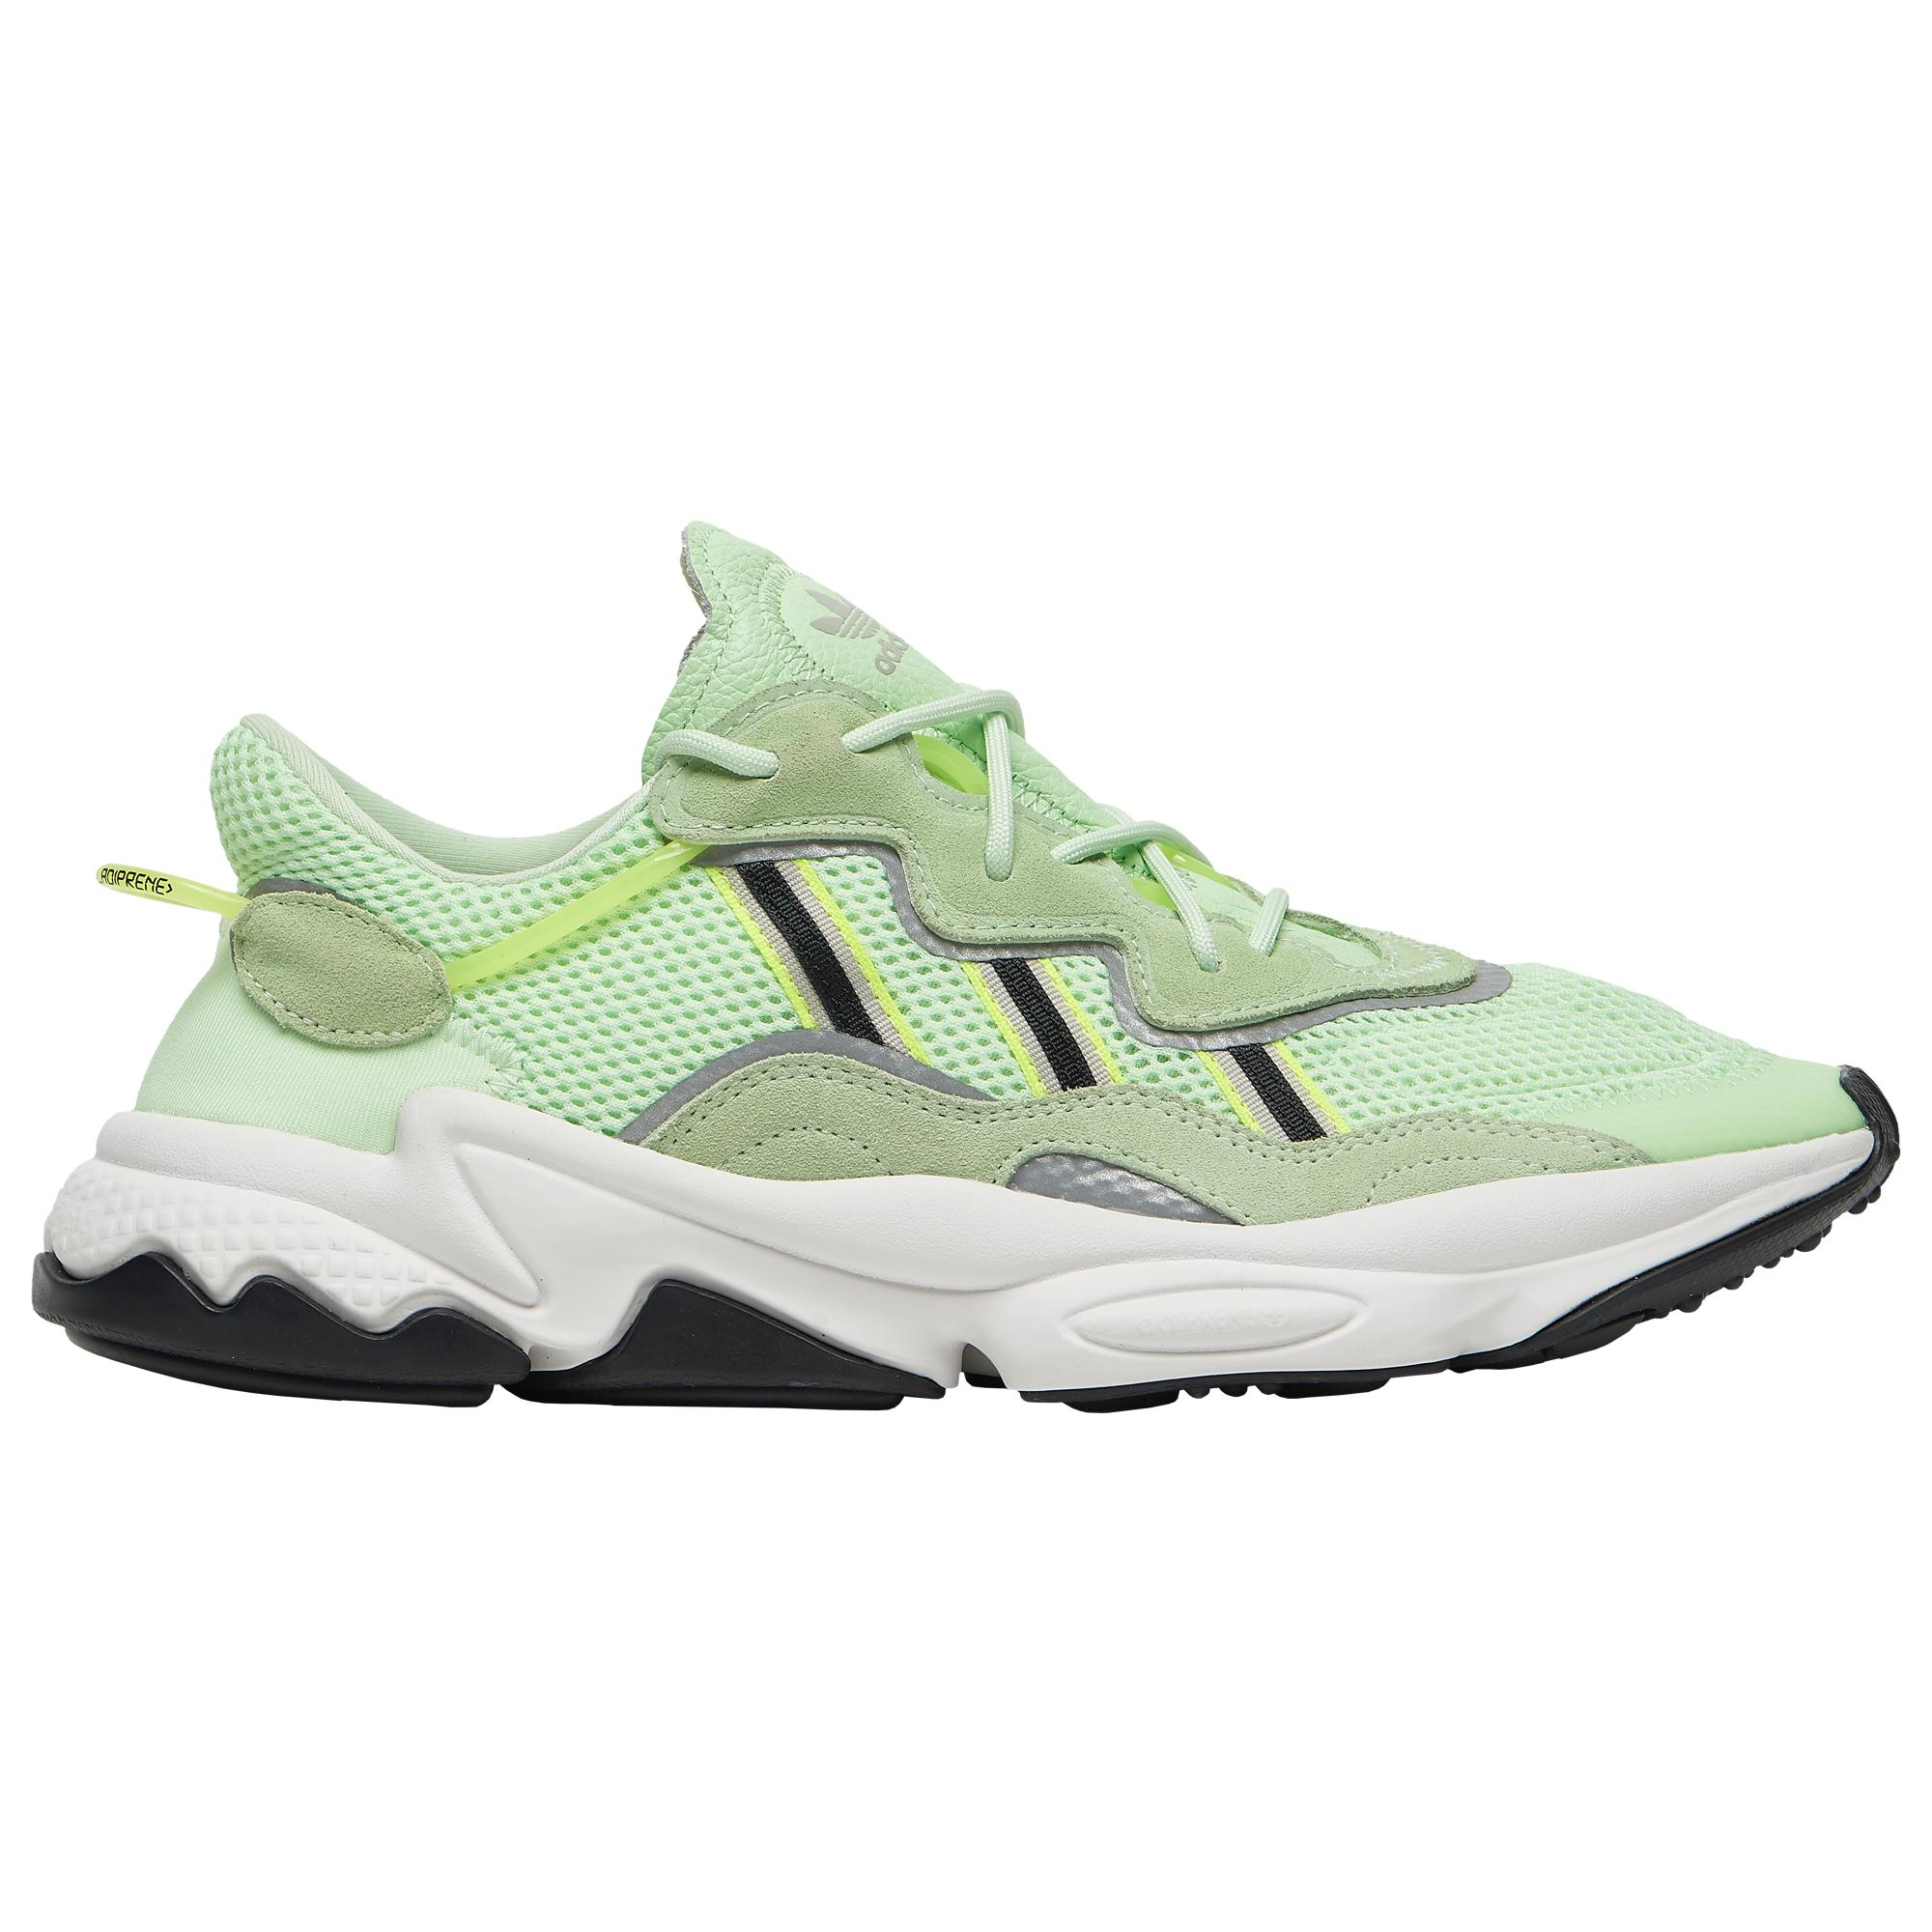 db7dae4b24ef Men's Green Ozweego Running Shoes